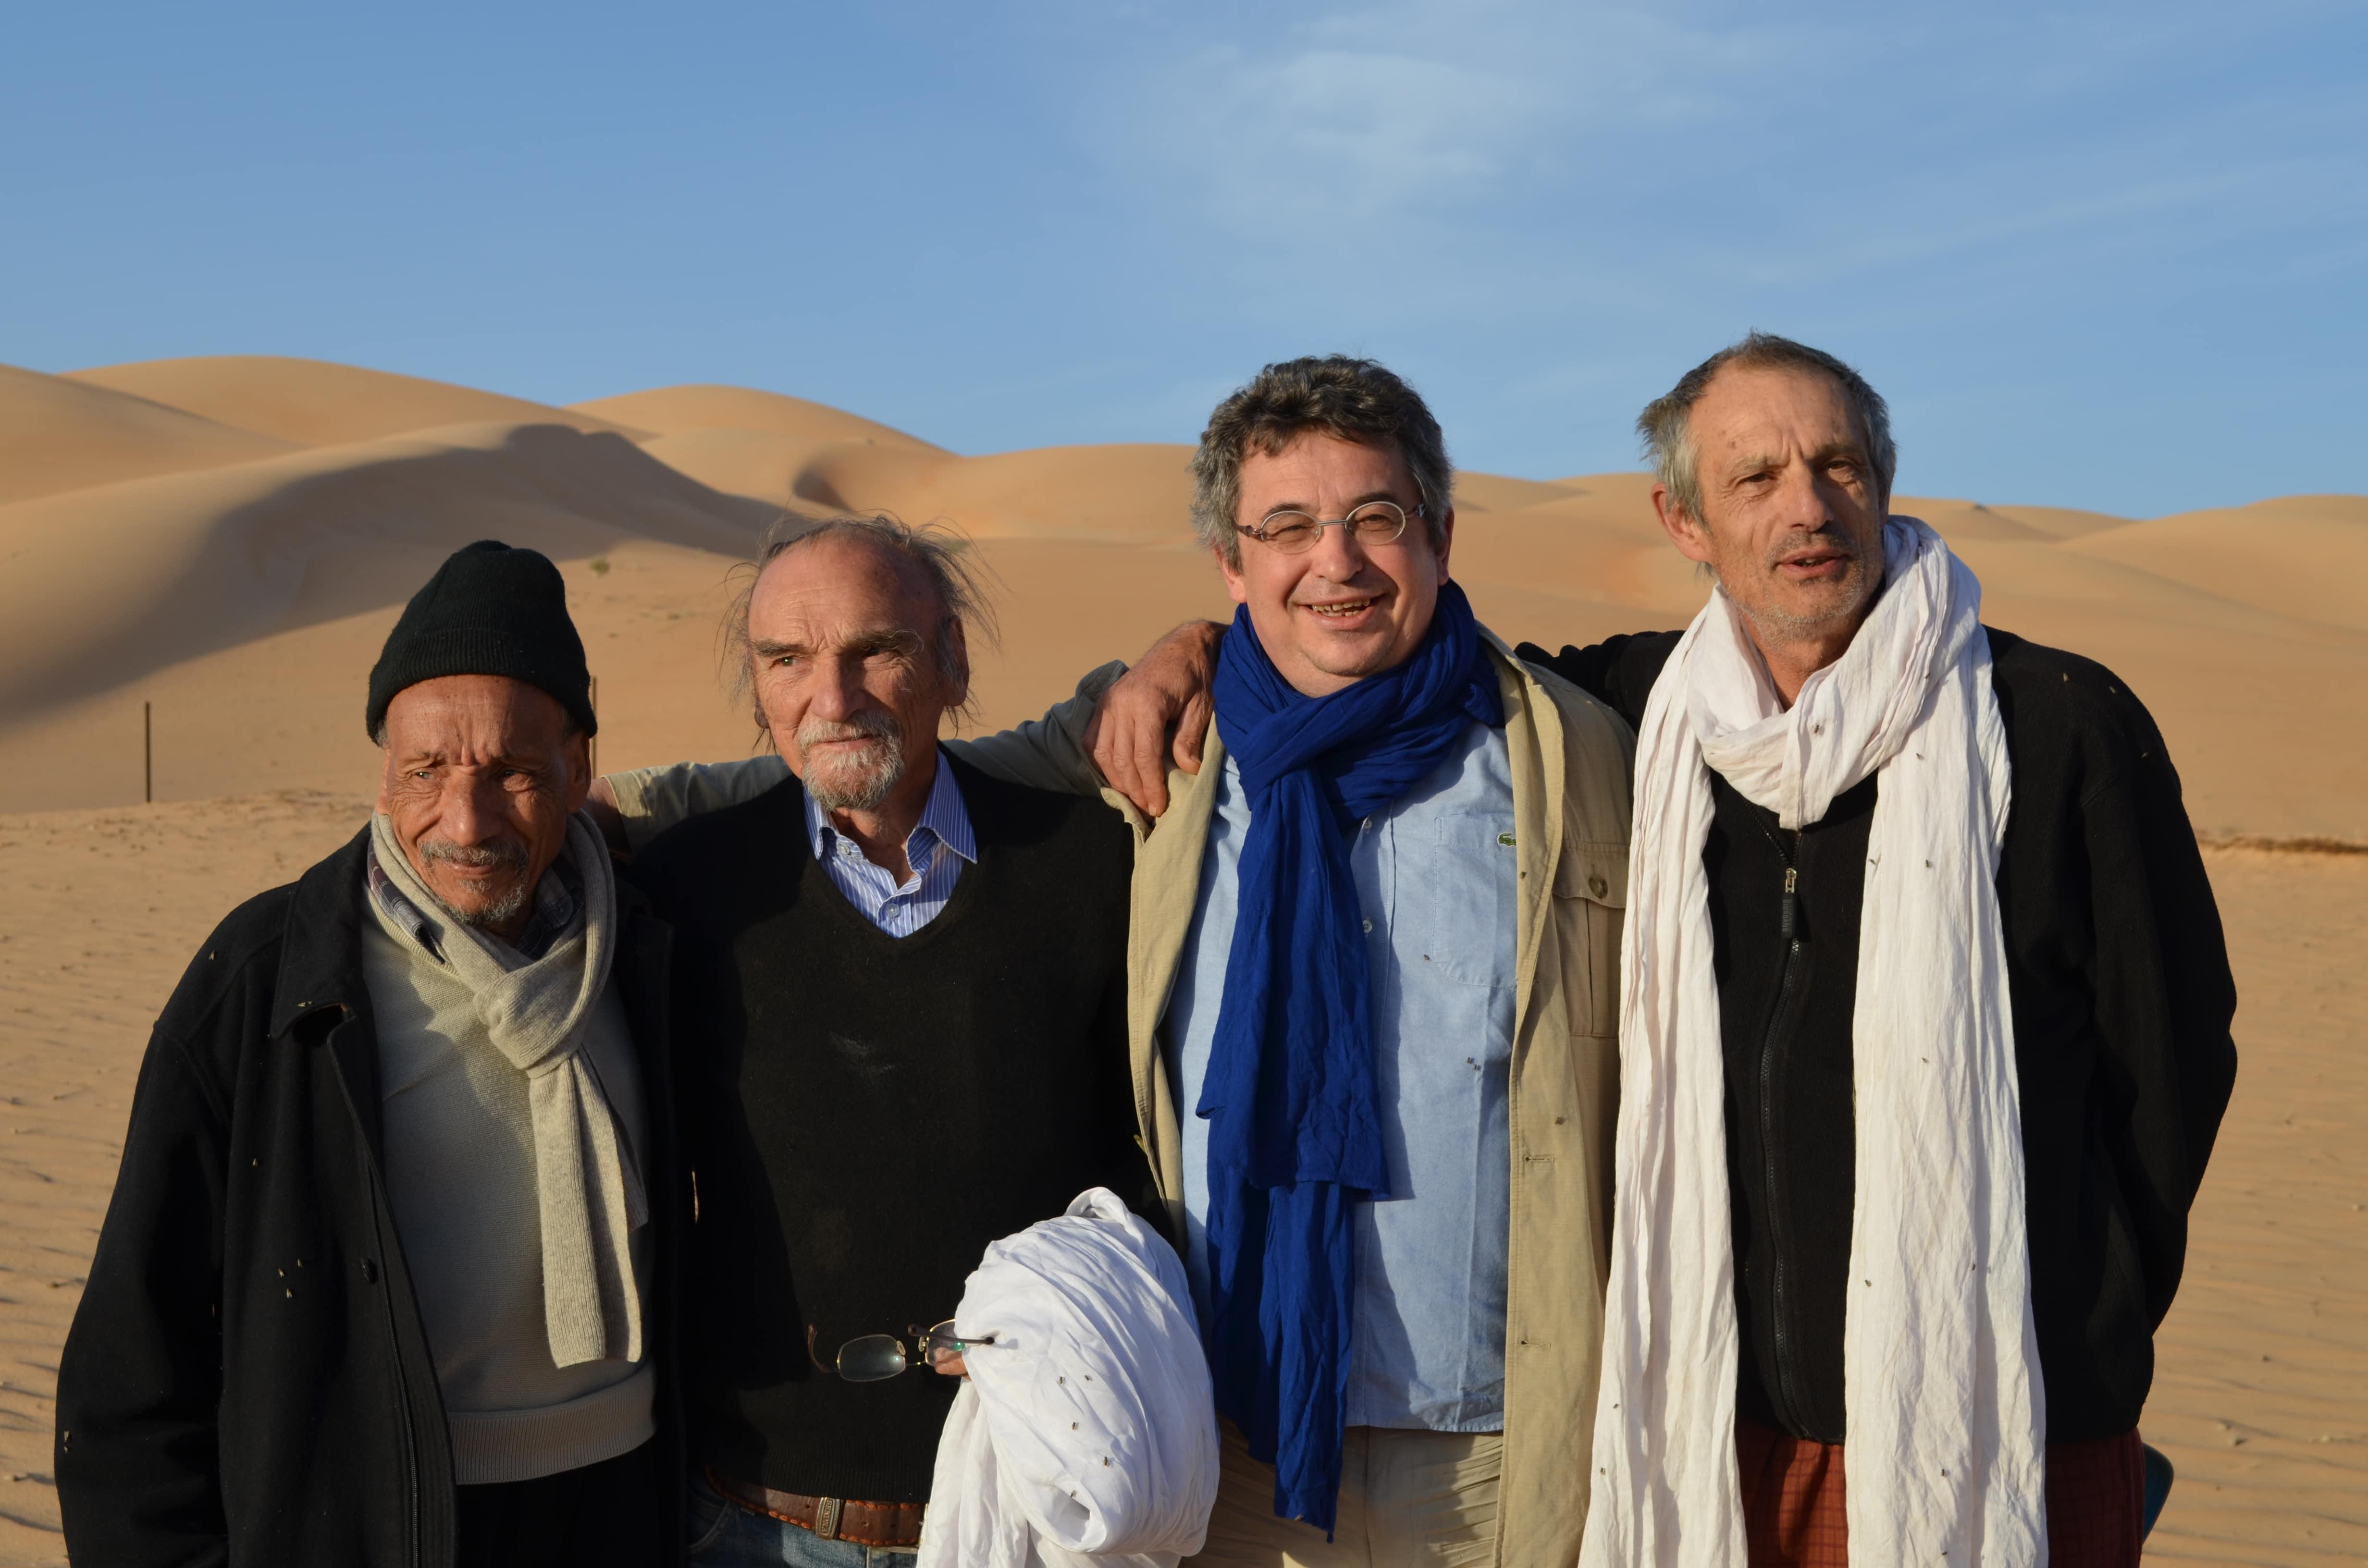 Pierre Rabhi, Maurice freund, Yacine Demaison et Jean-Joseph Boillot à Maaden en Mauritanie